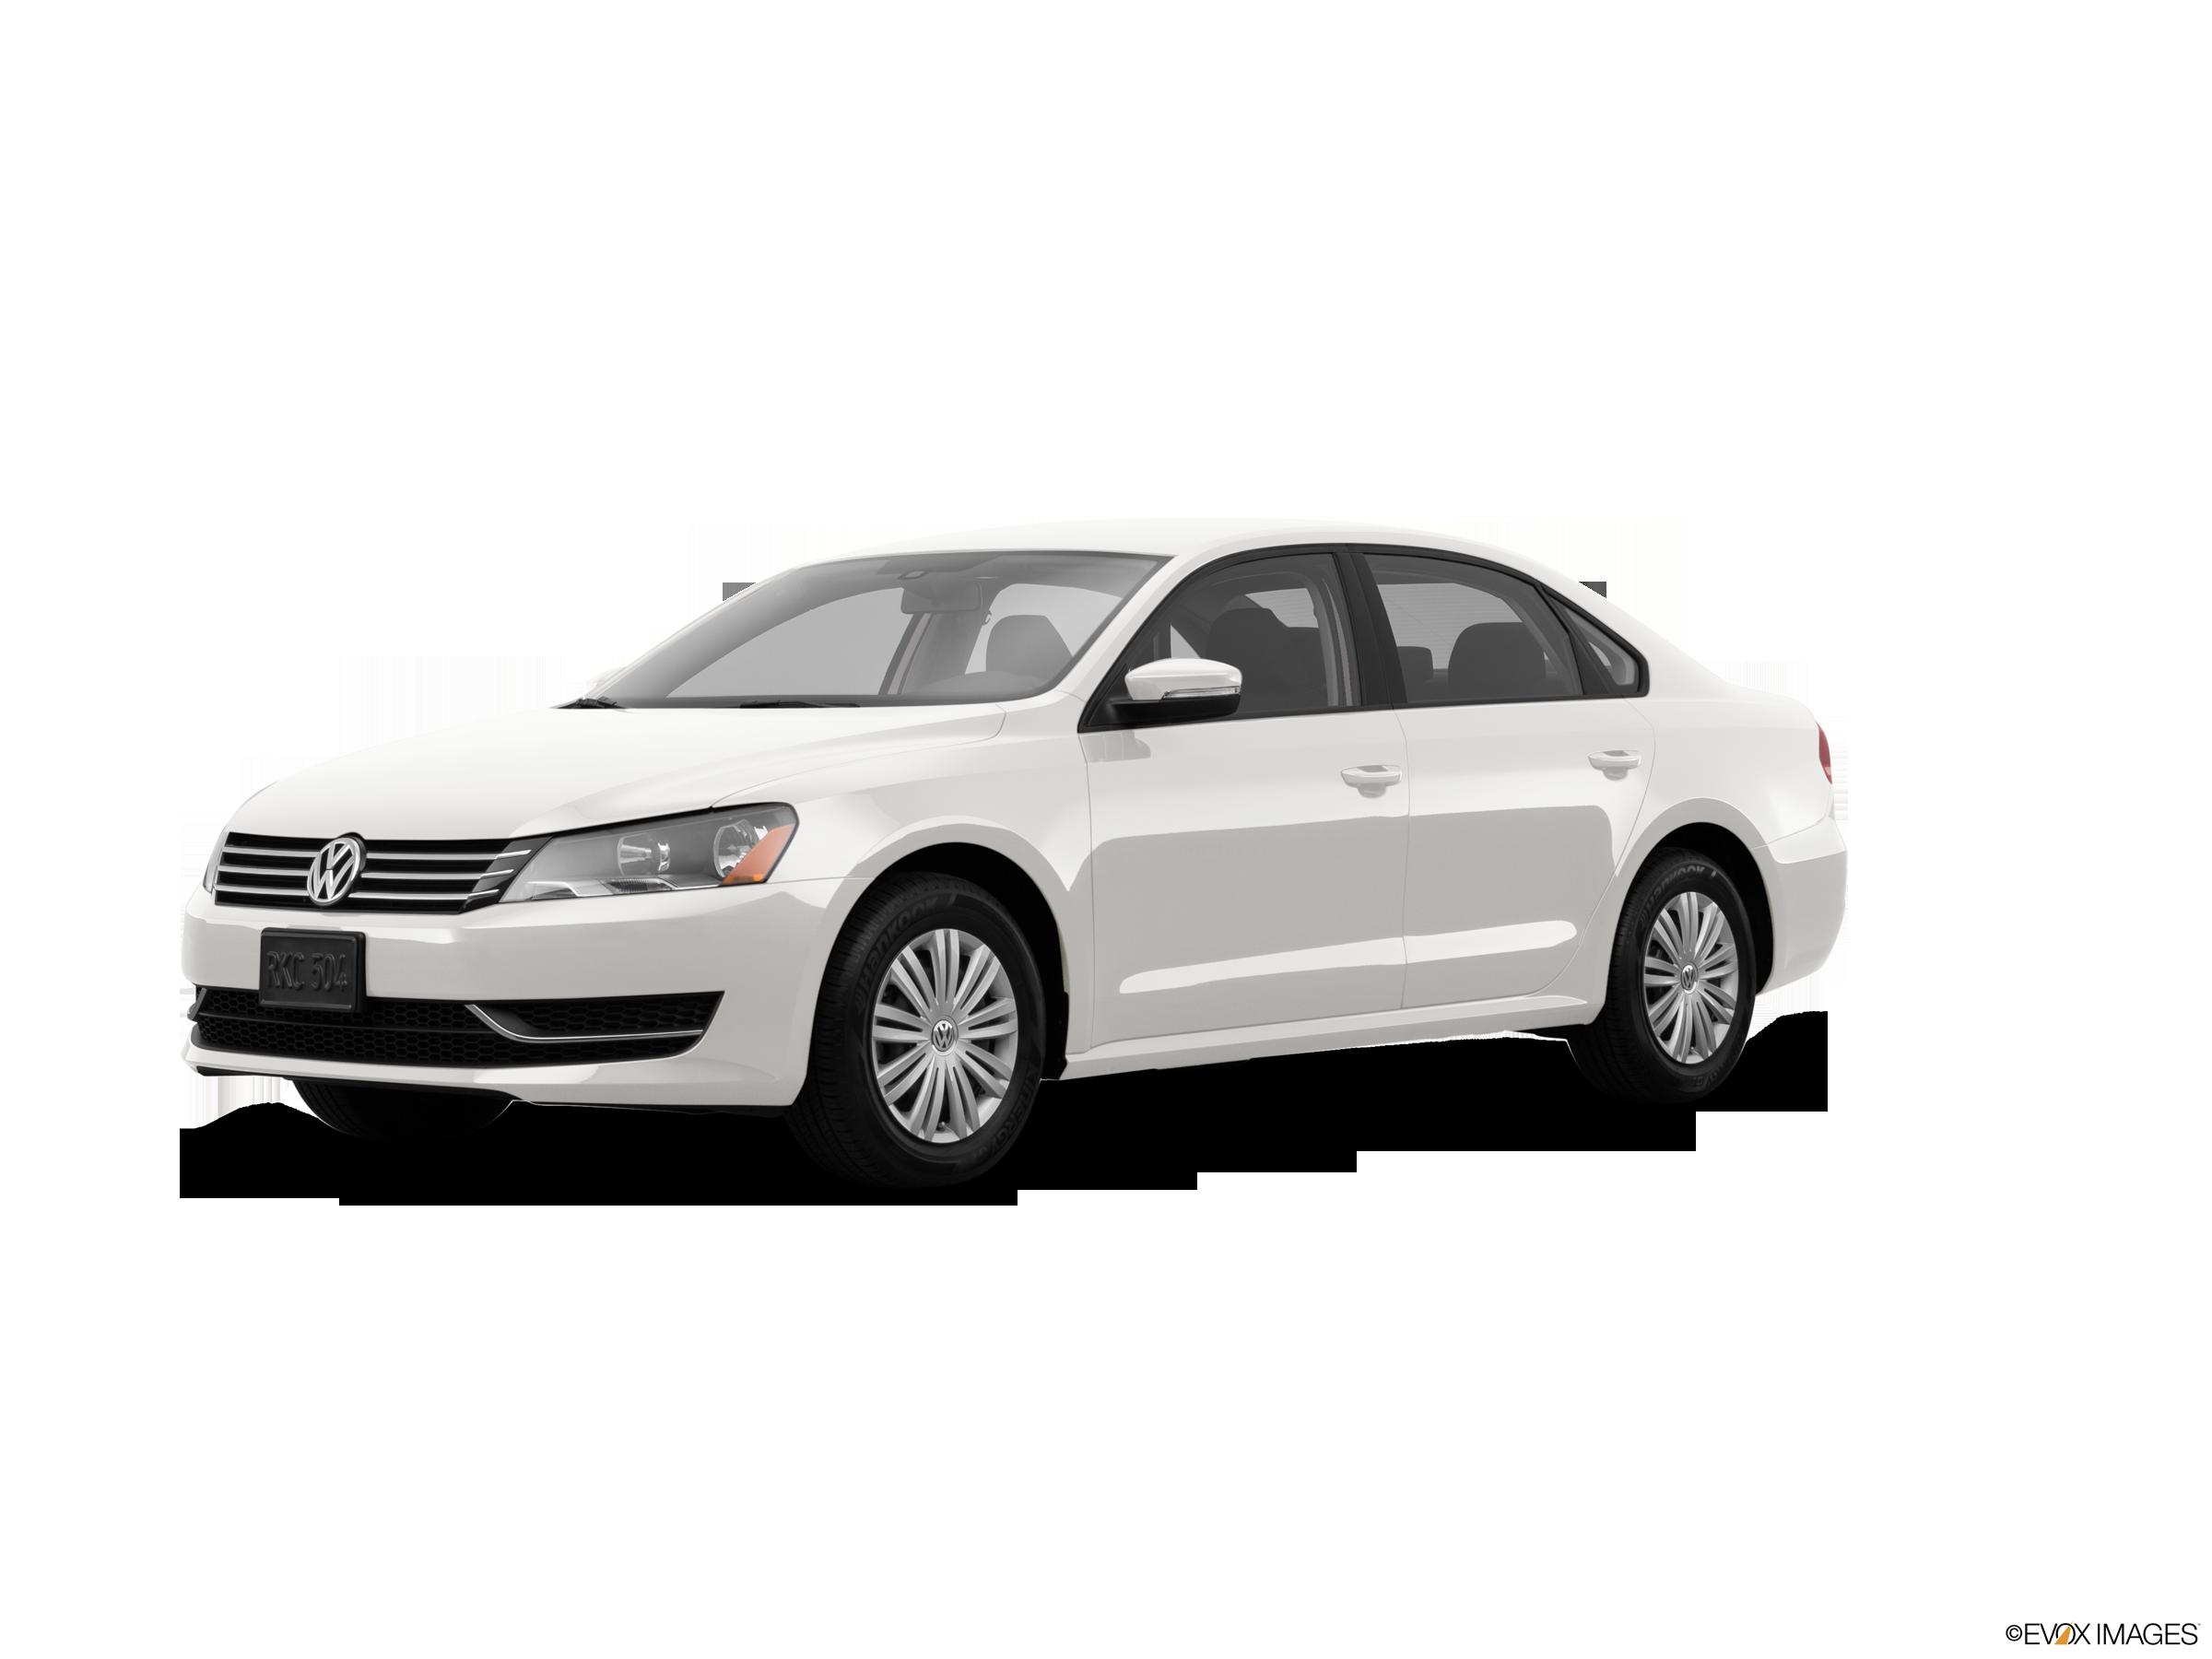 2015 Volkswagen Passat Values Cars For Sale Kelley Blue Book